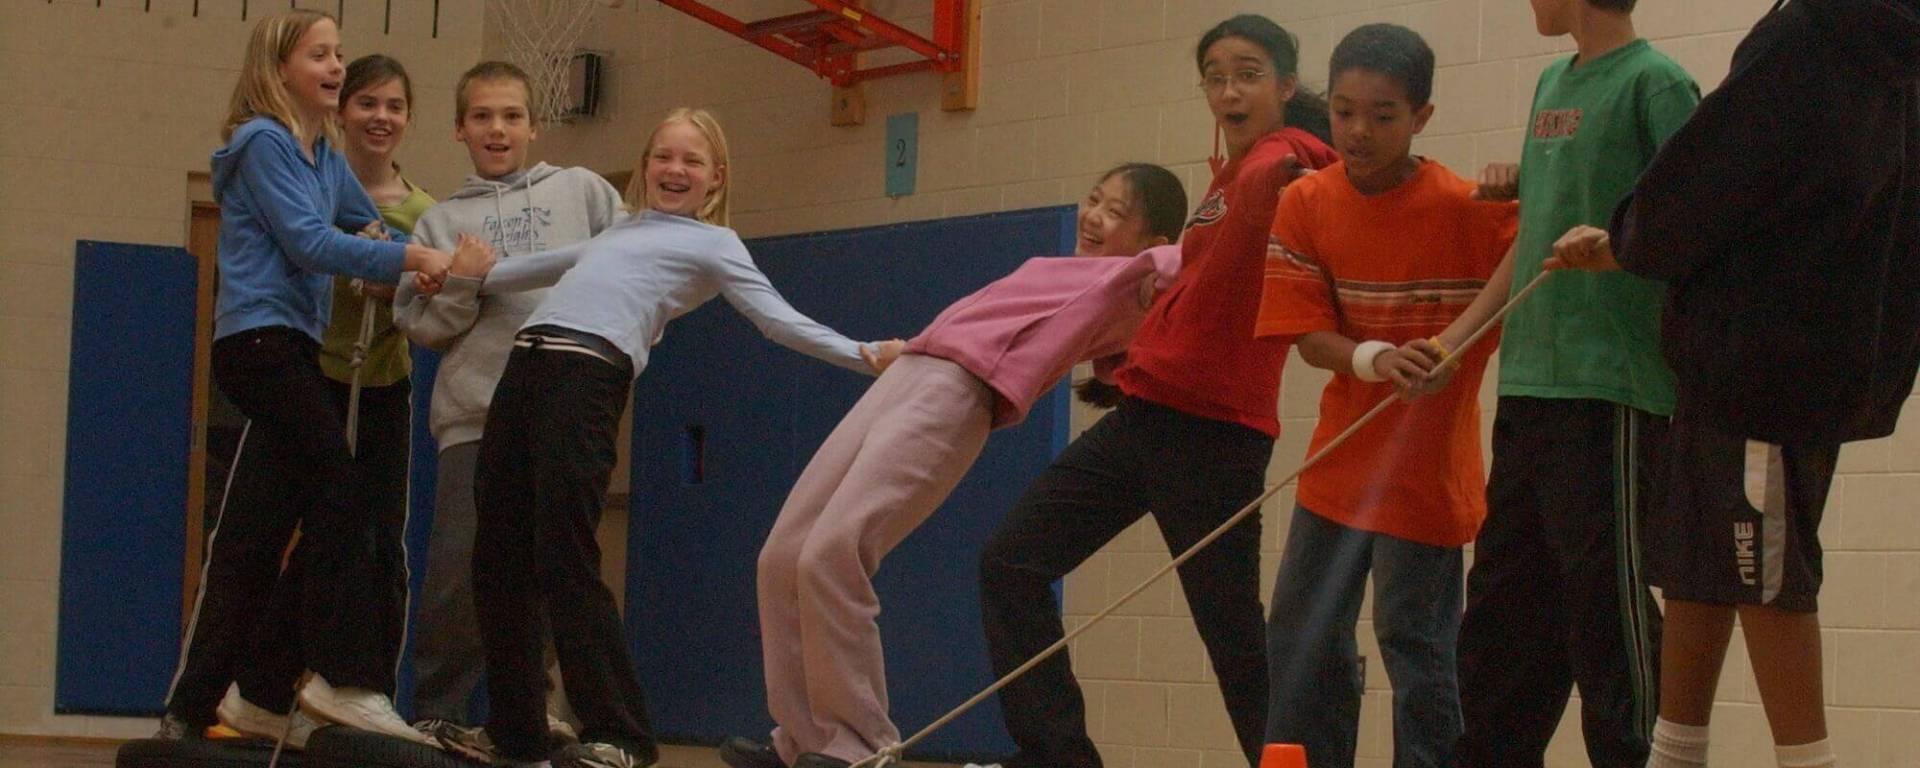 Tem Building activities for developing social skills